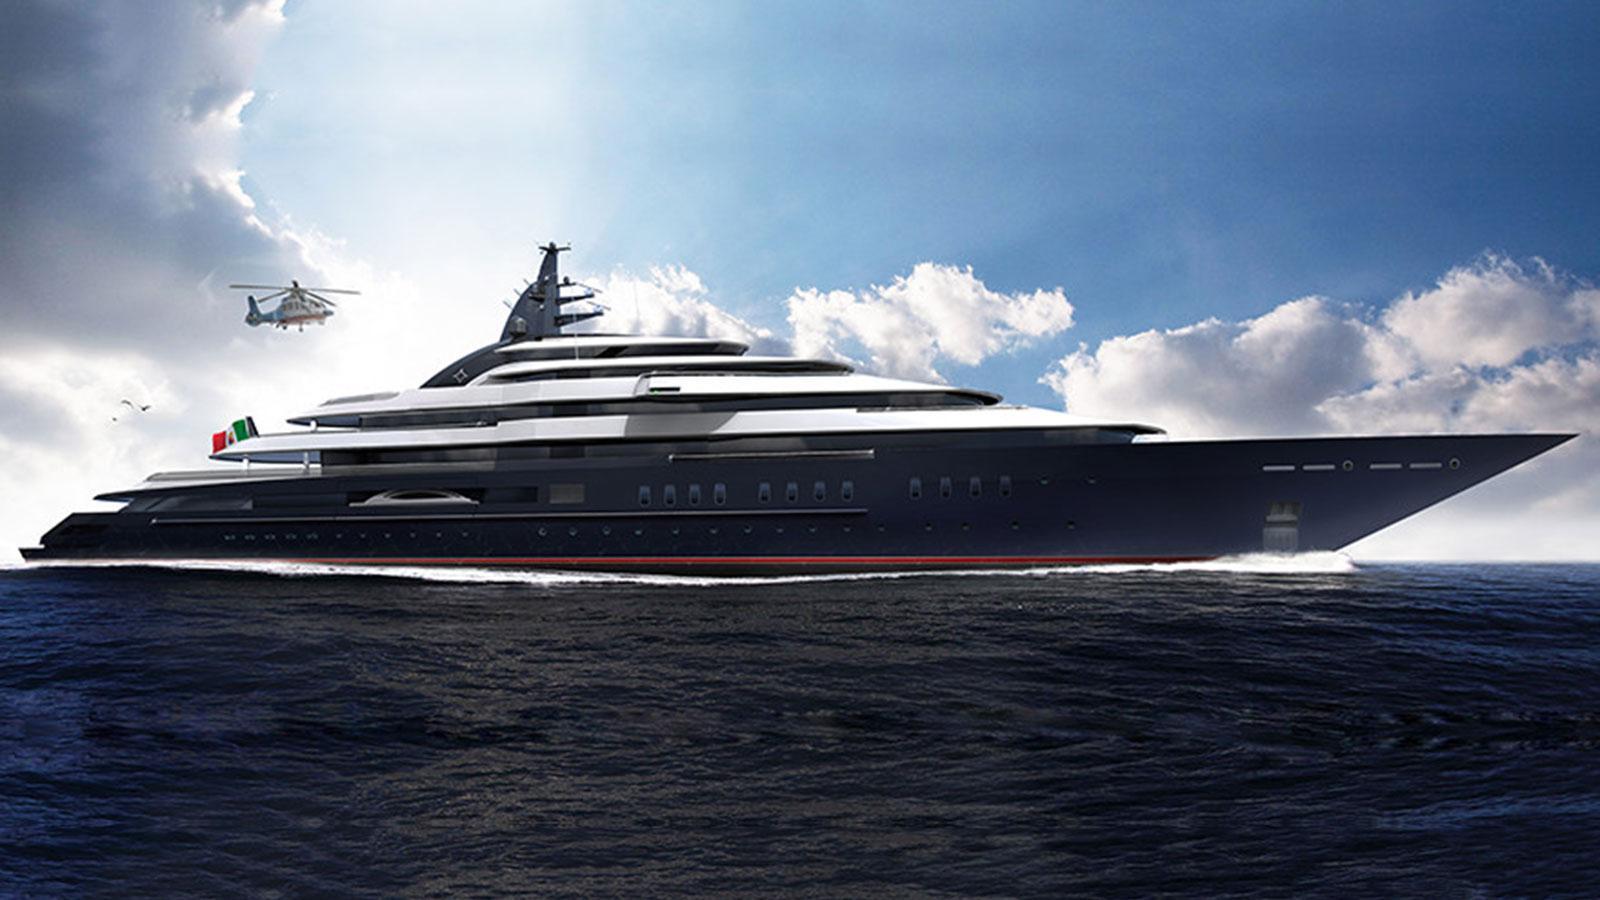 project-redwood-motoryacht-lurssen-2019-139m-rendering